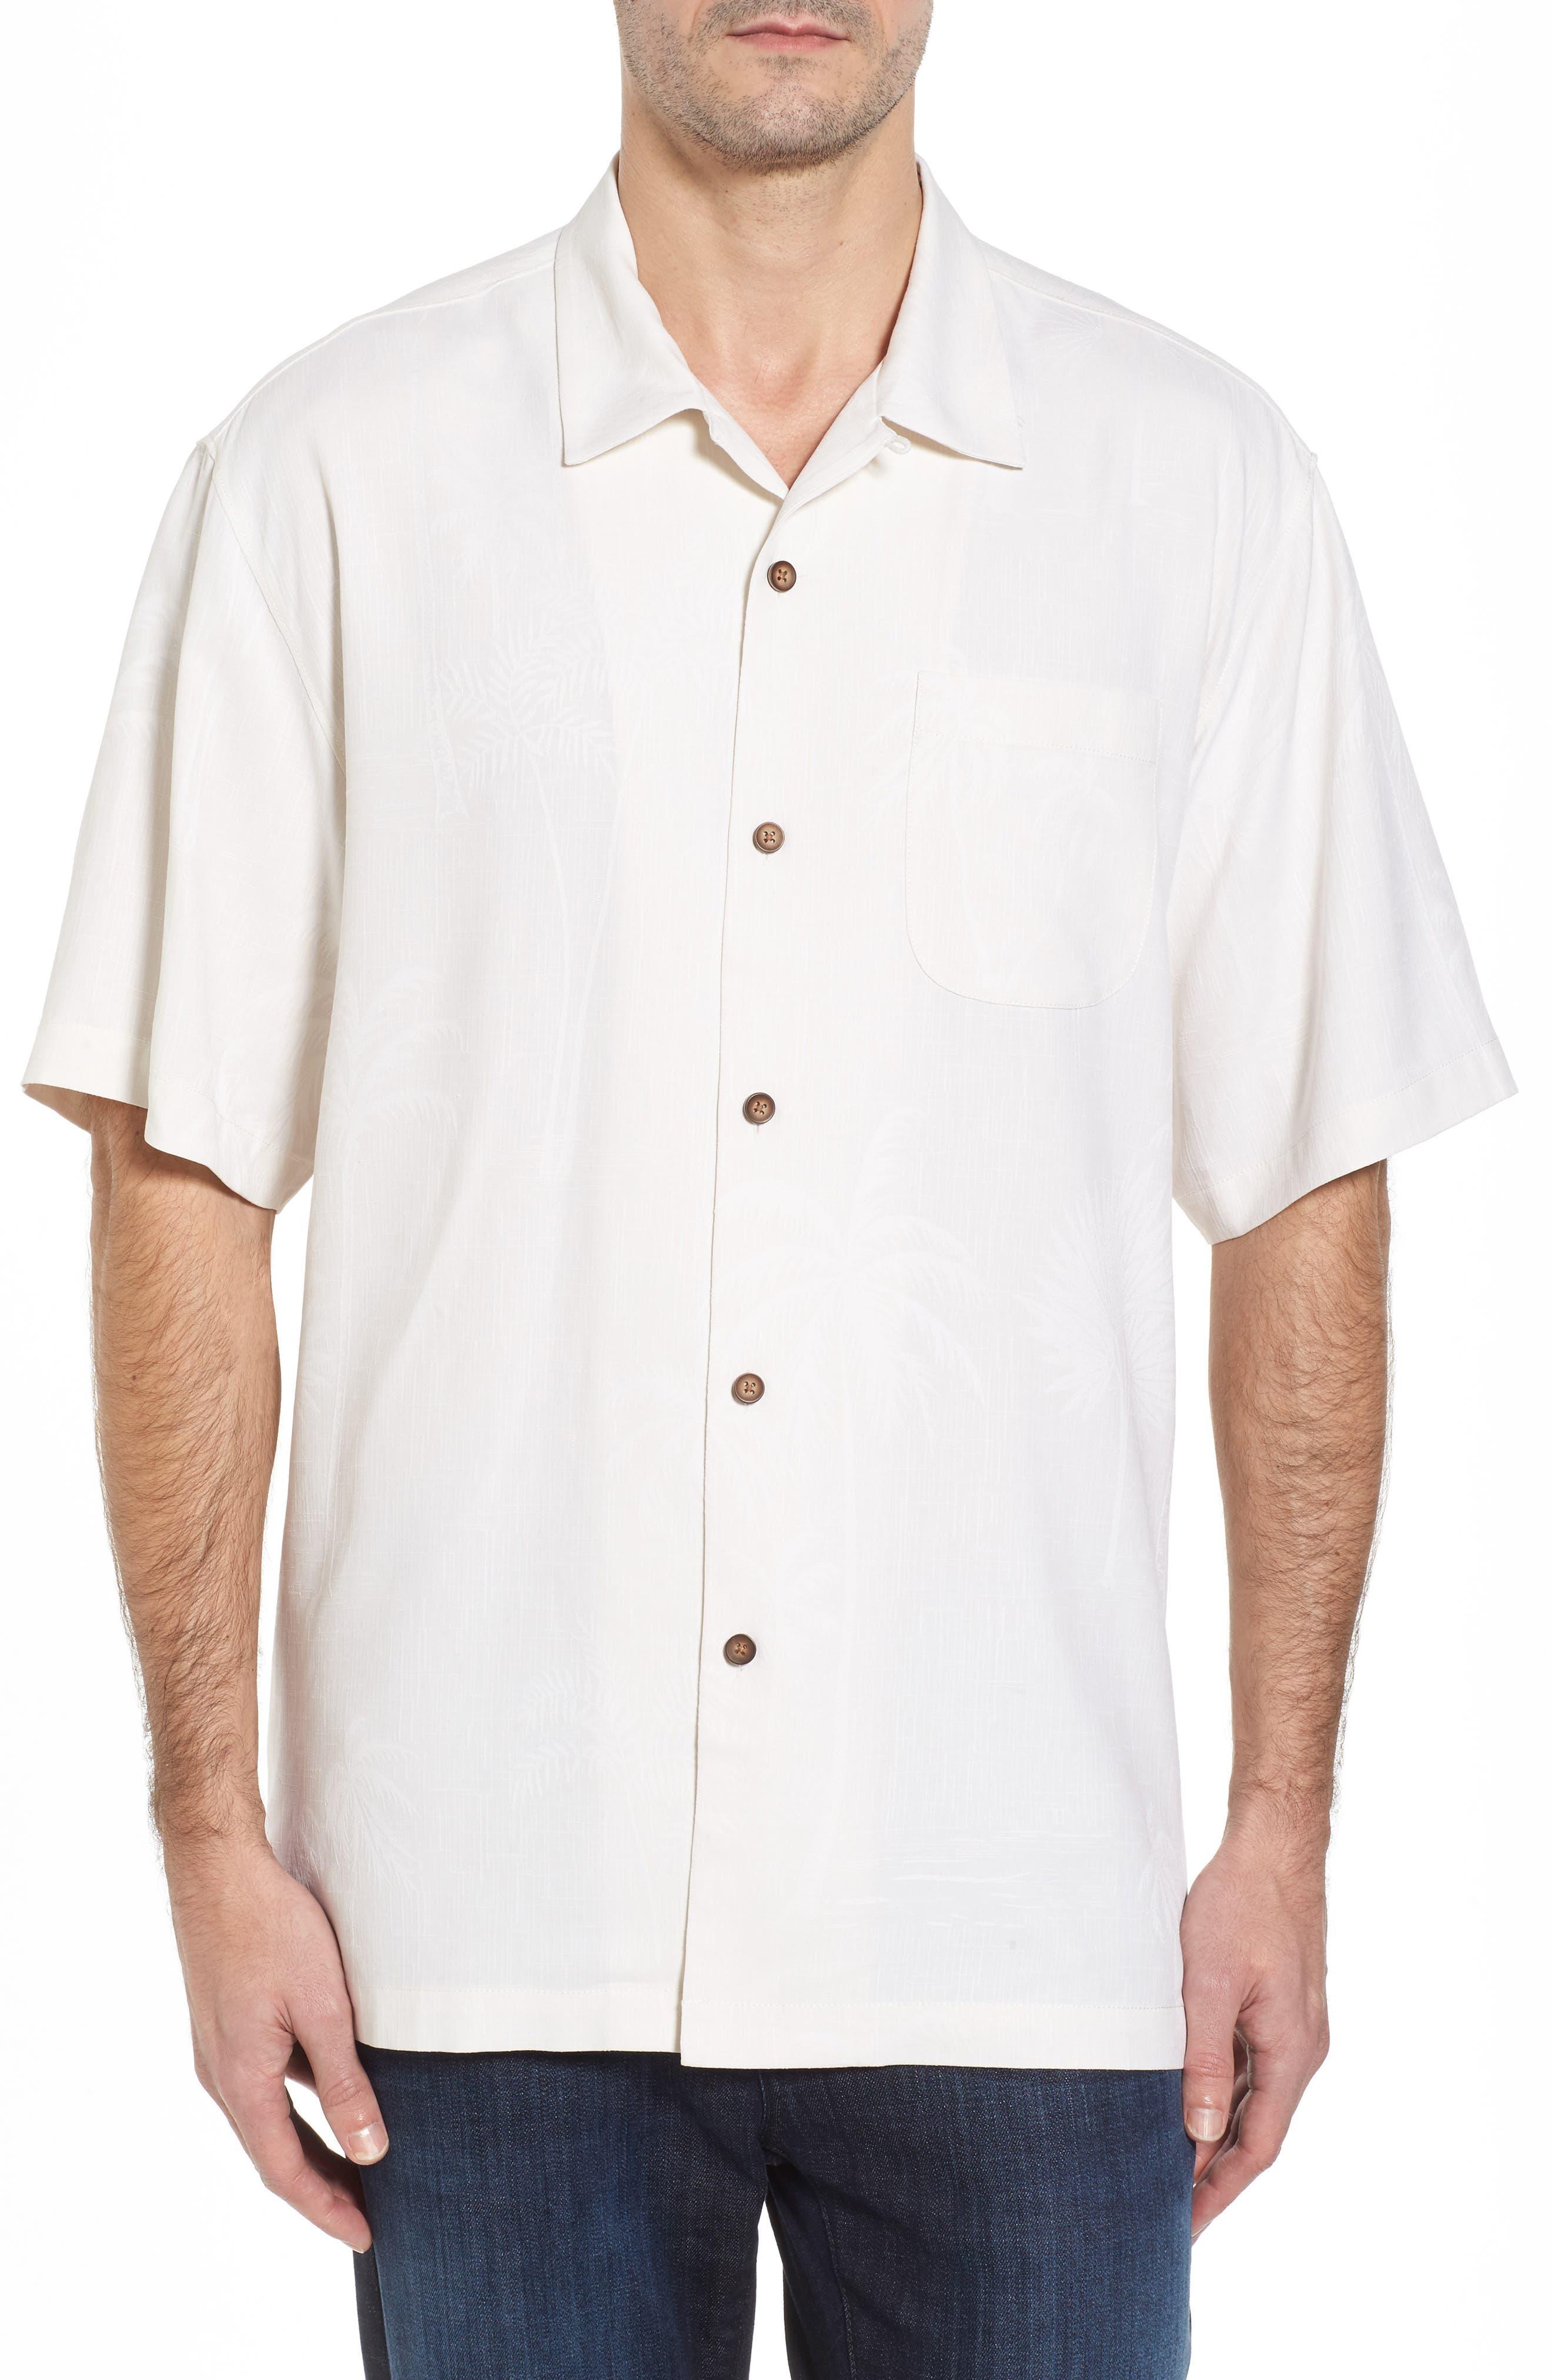 Offshore Sails Silk Camp Shirt,                             Main thumbnail 1, color,                             100